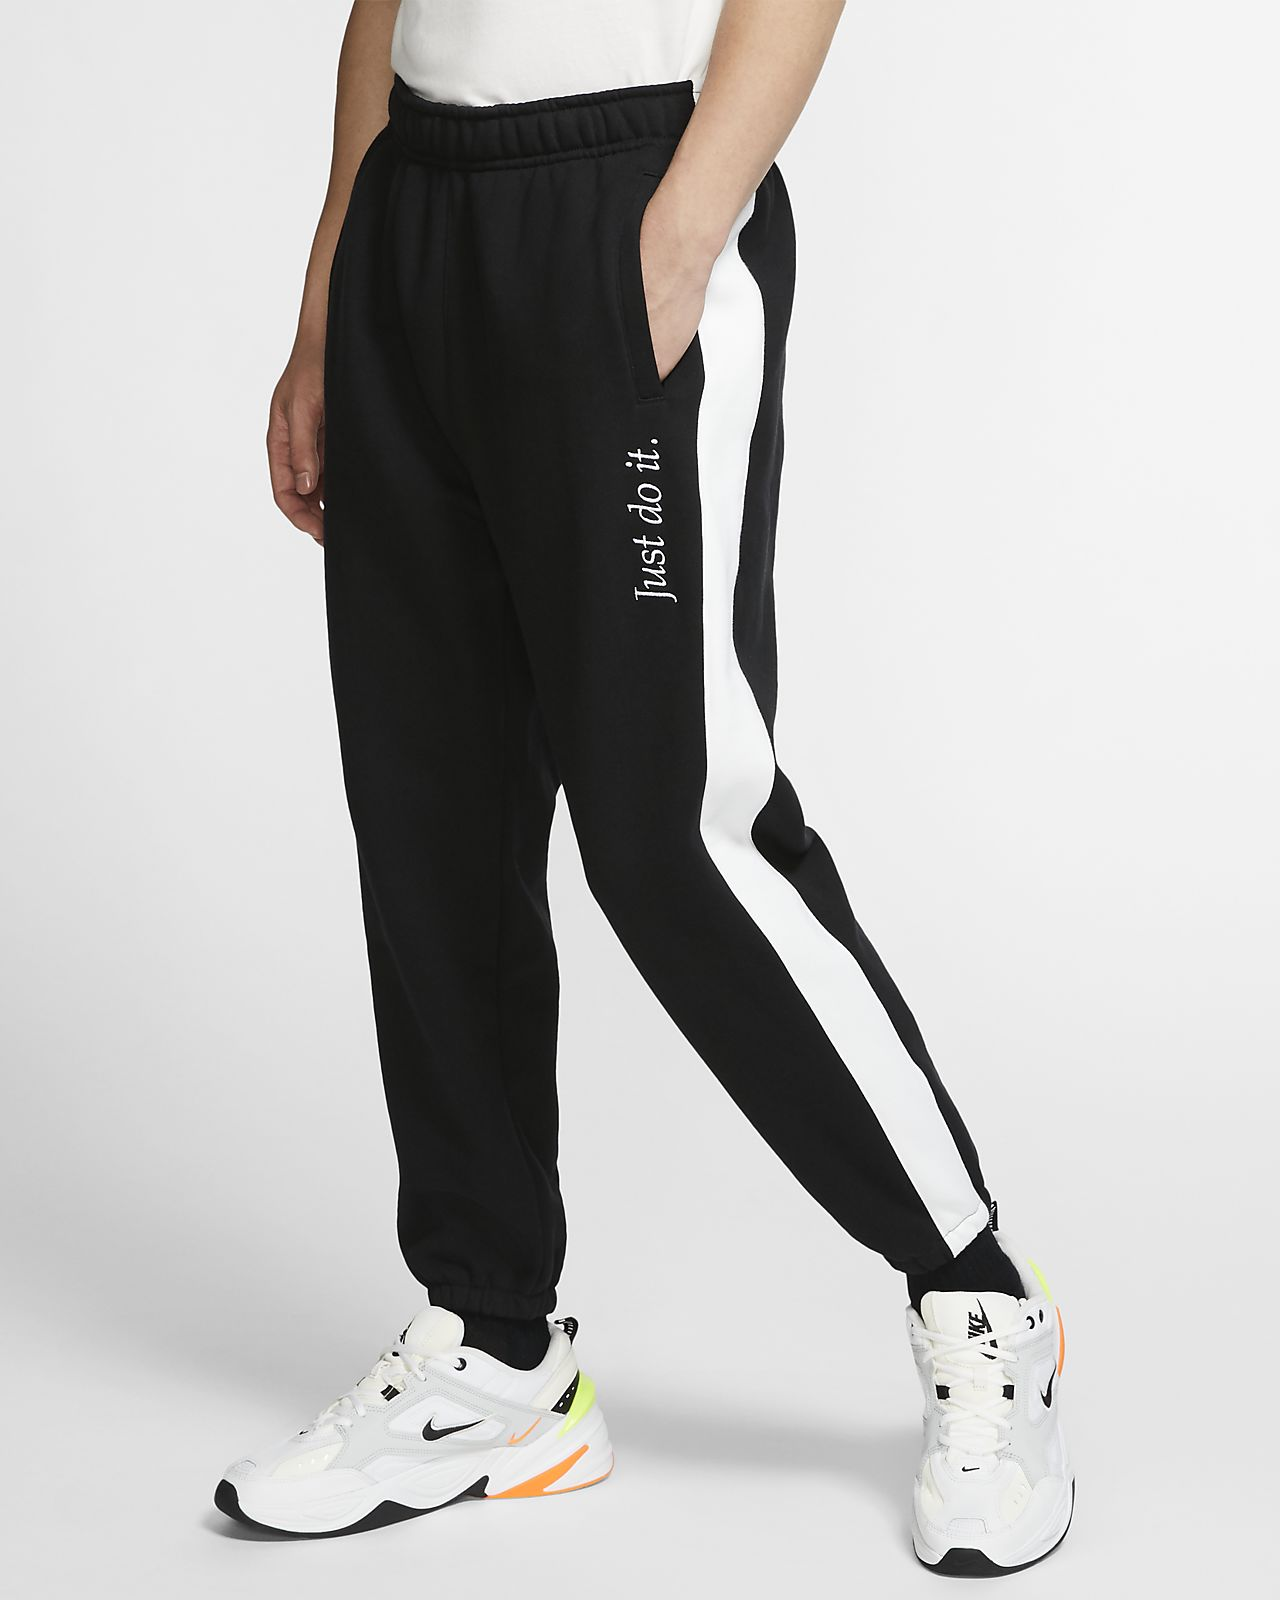 Nike Air Max 90 EssentialGrey MistWhite Black Dark Grey